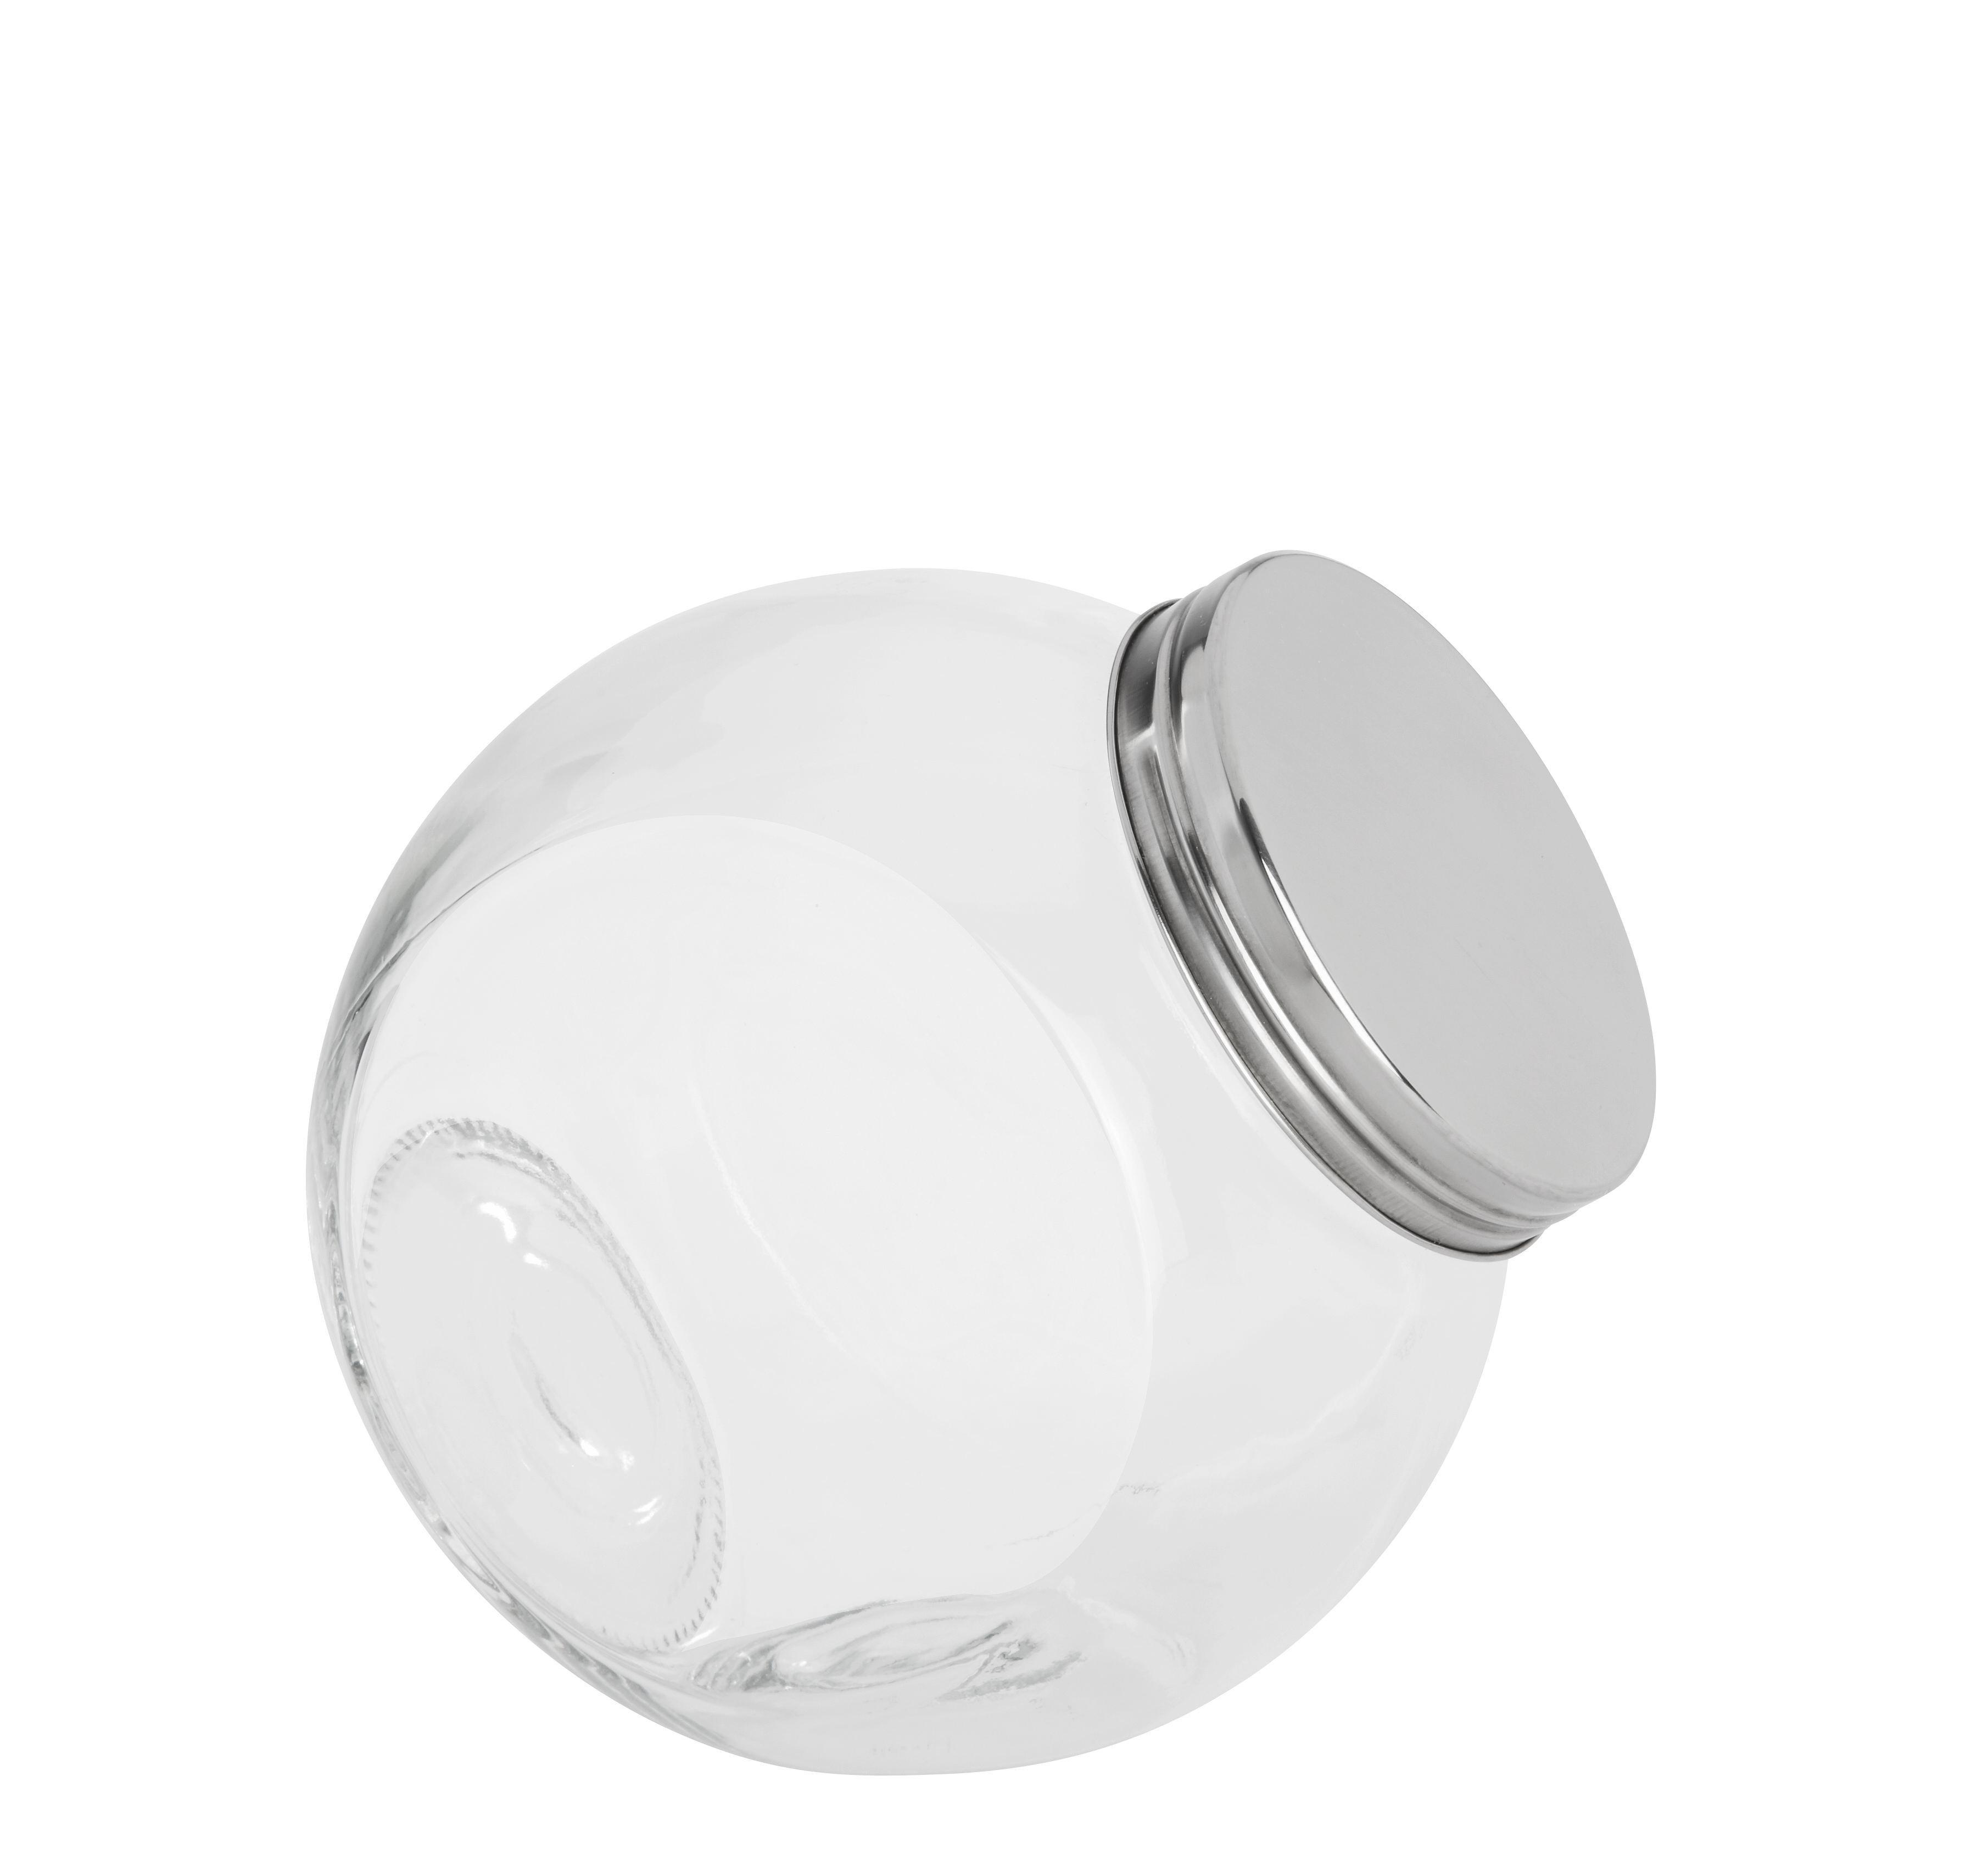 Gewürzglas Antonius aus Glas - Klar/Edelstahlfarben, Glas (16/11/16,5cm) - BASED